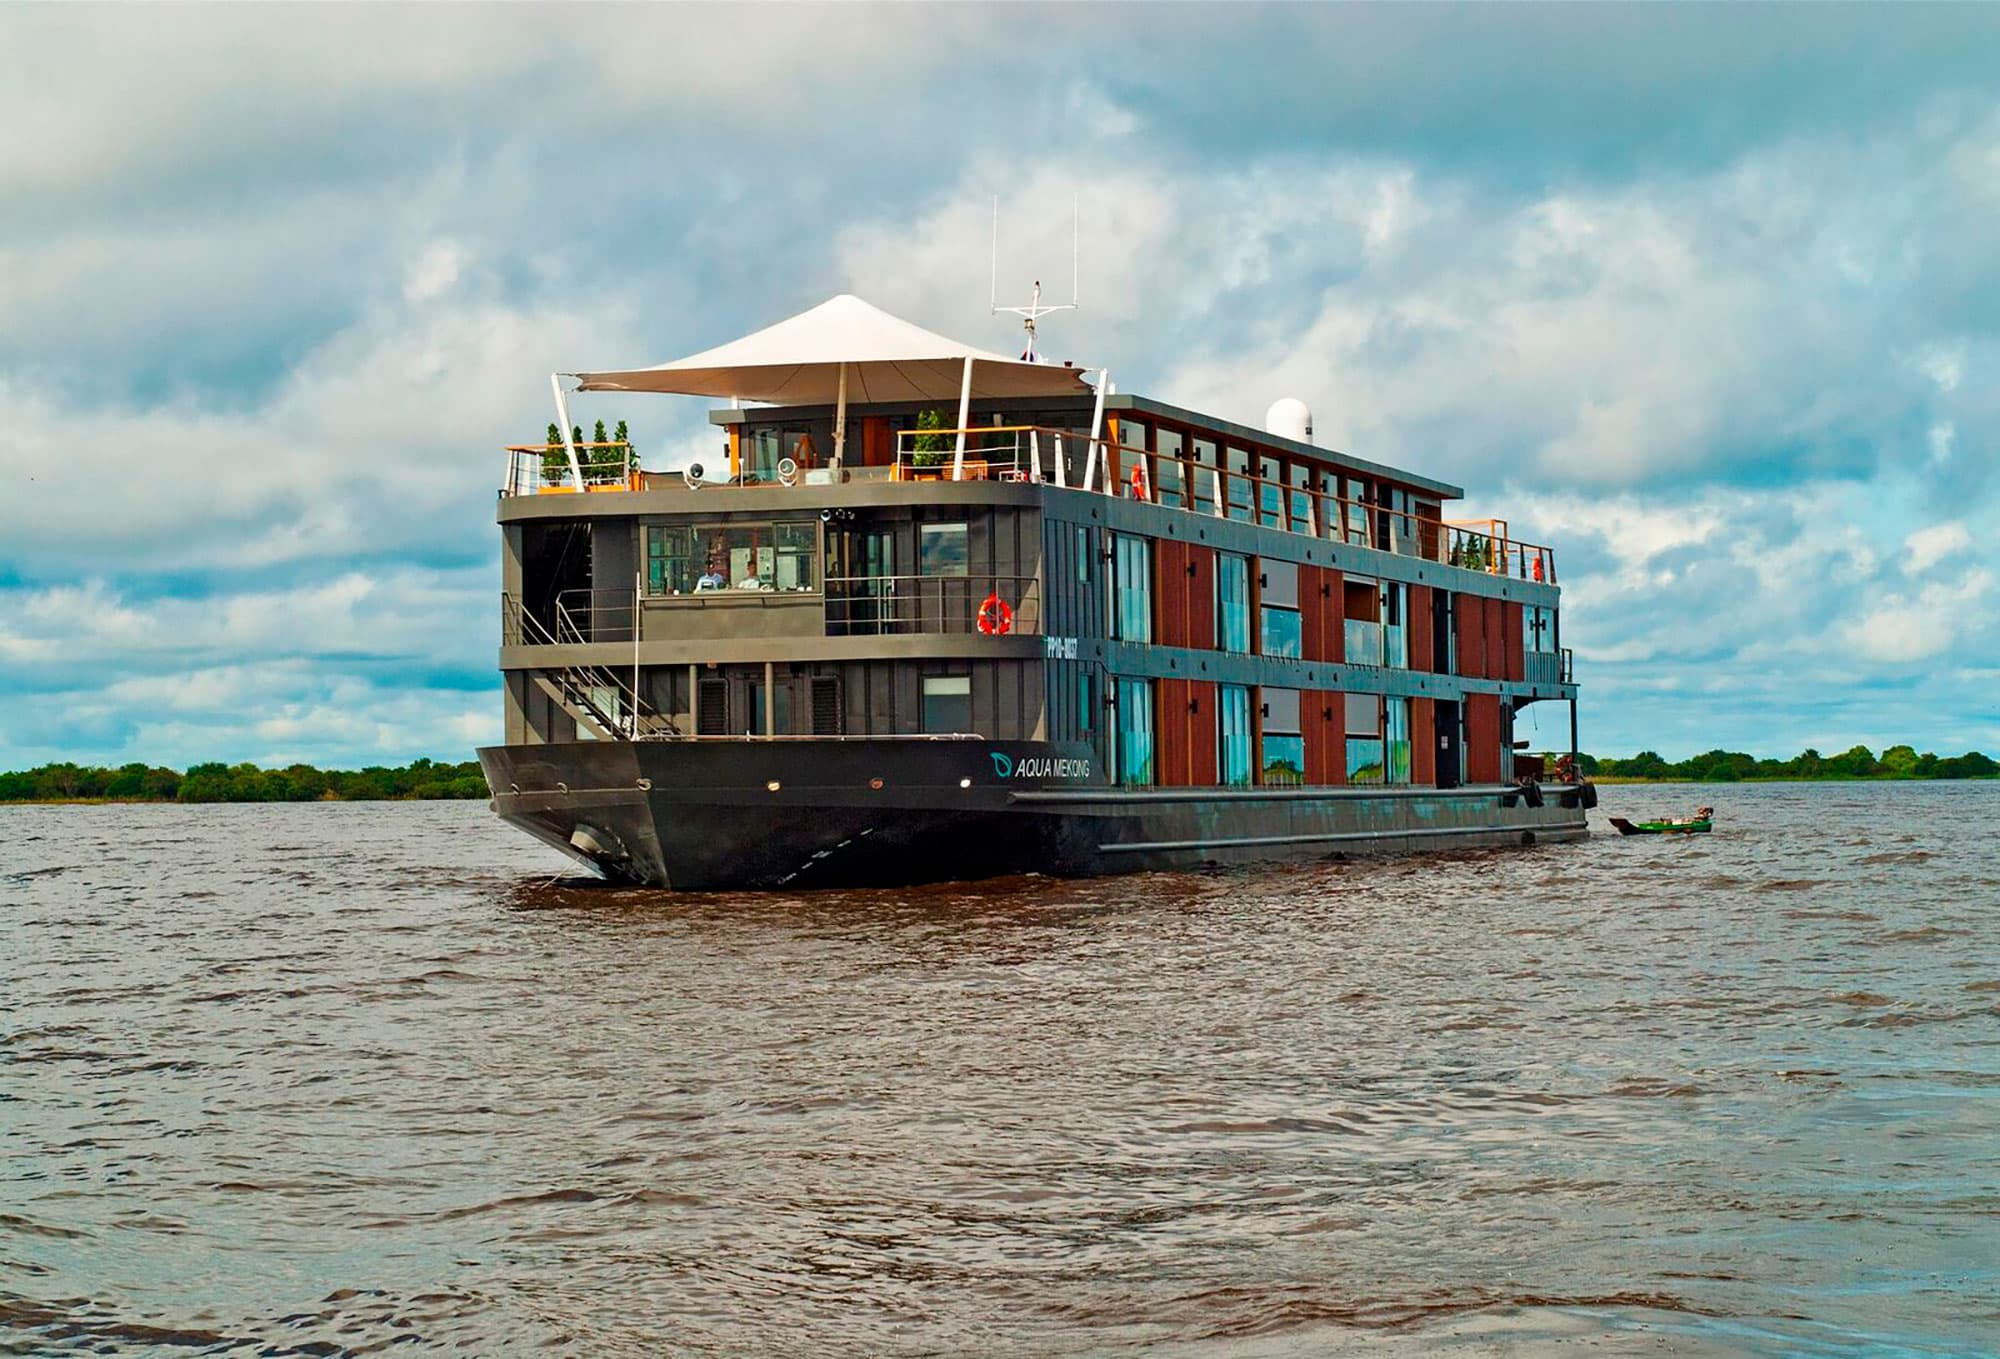 Crucero AQUA de 7 noches – Río arriba – Temporada de Agua Alta (De Ho Chi Minh a Siem Riep) - Vietnam- imagen #6